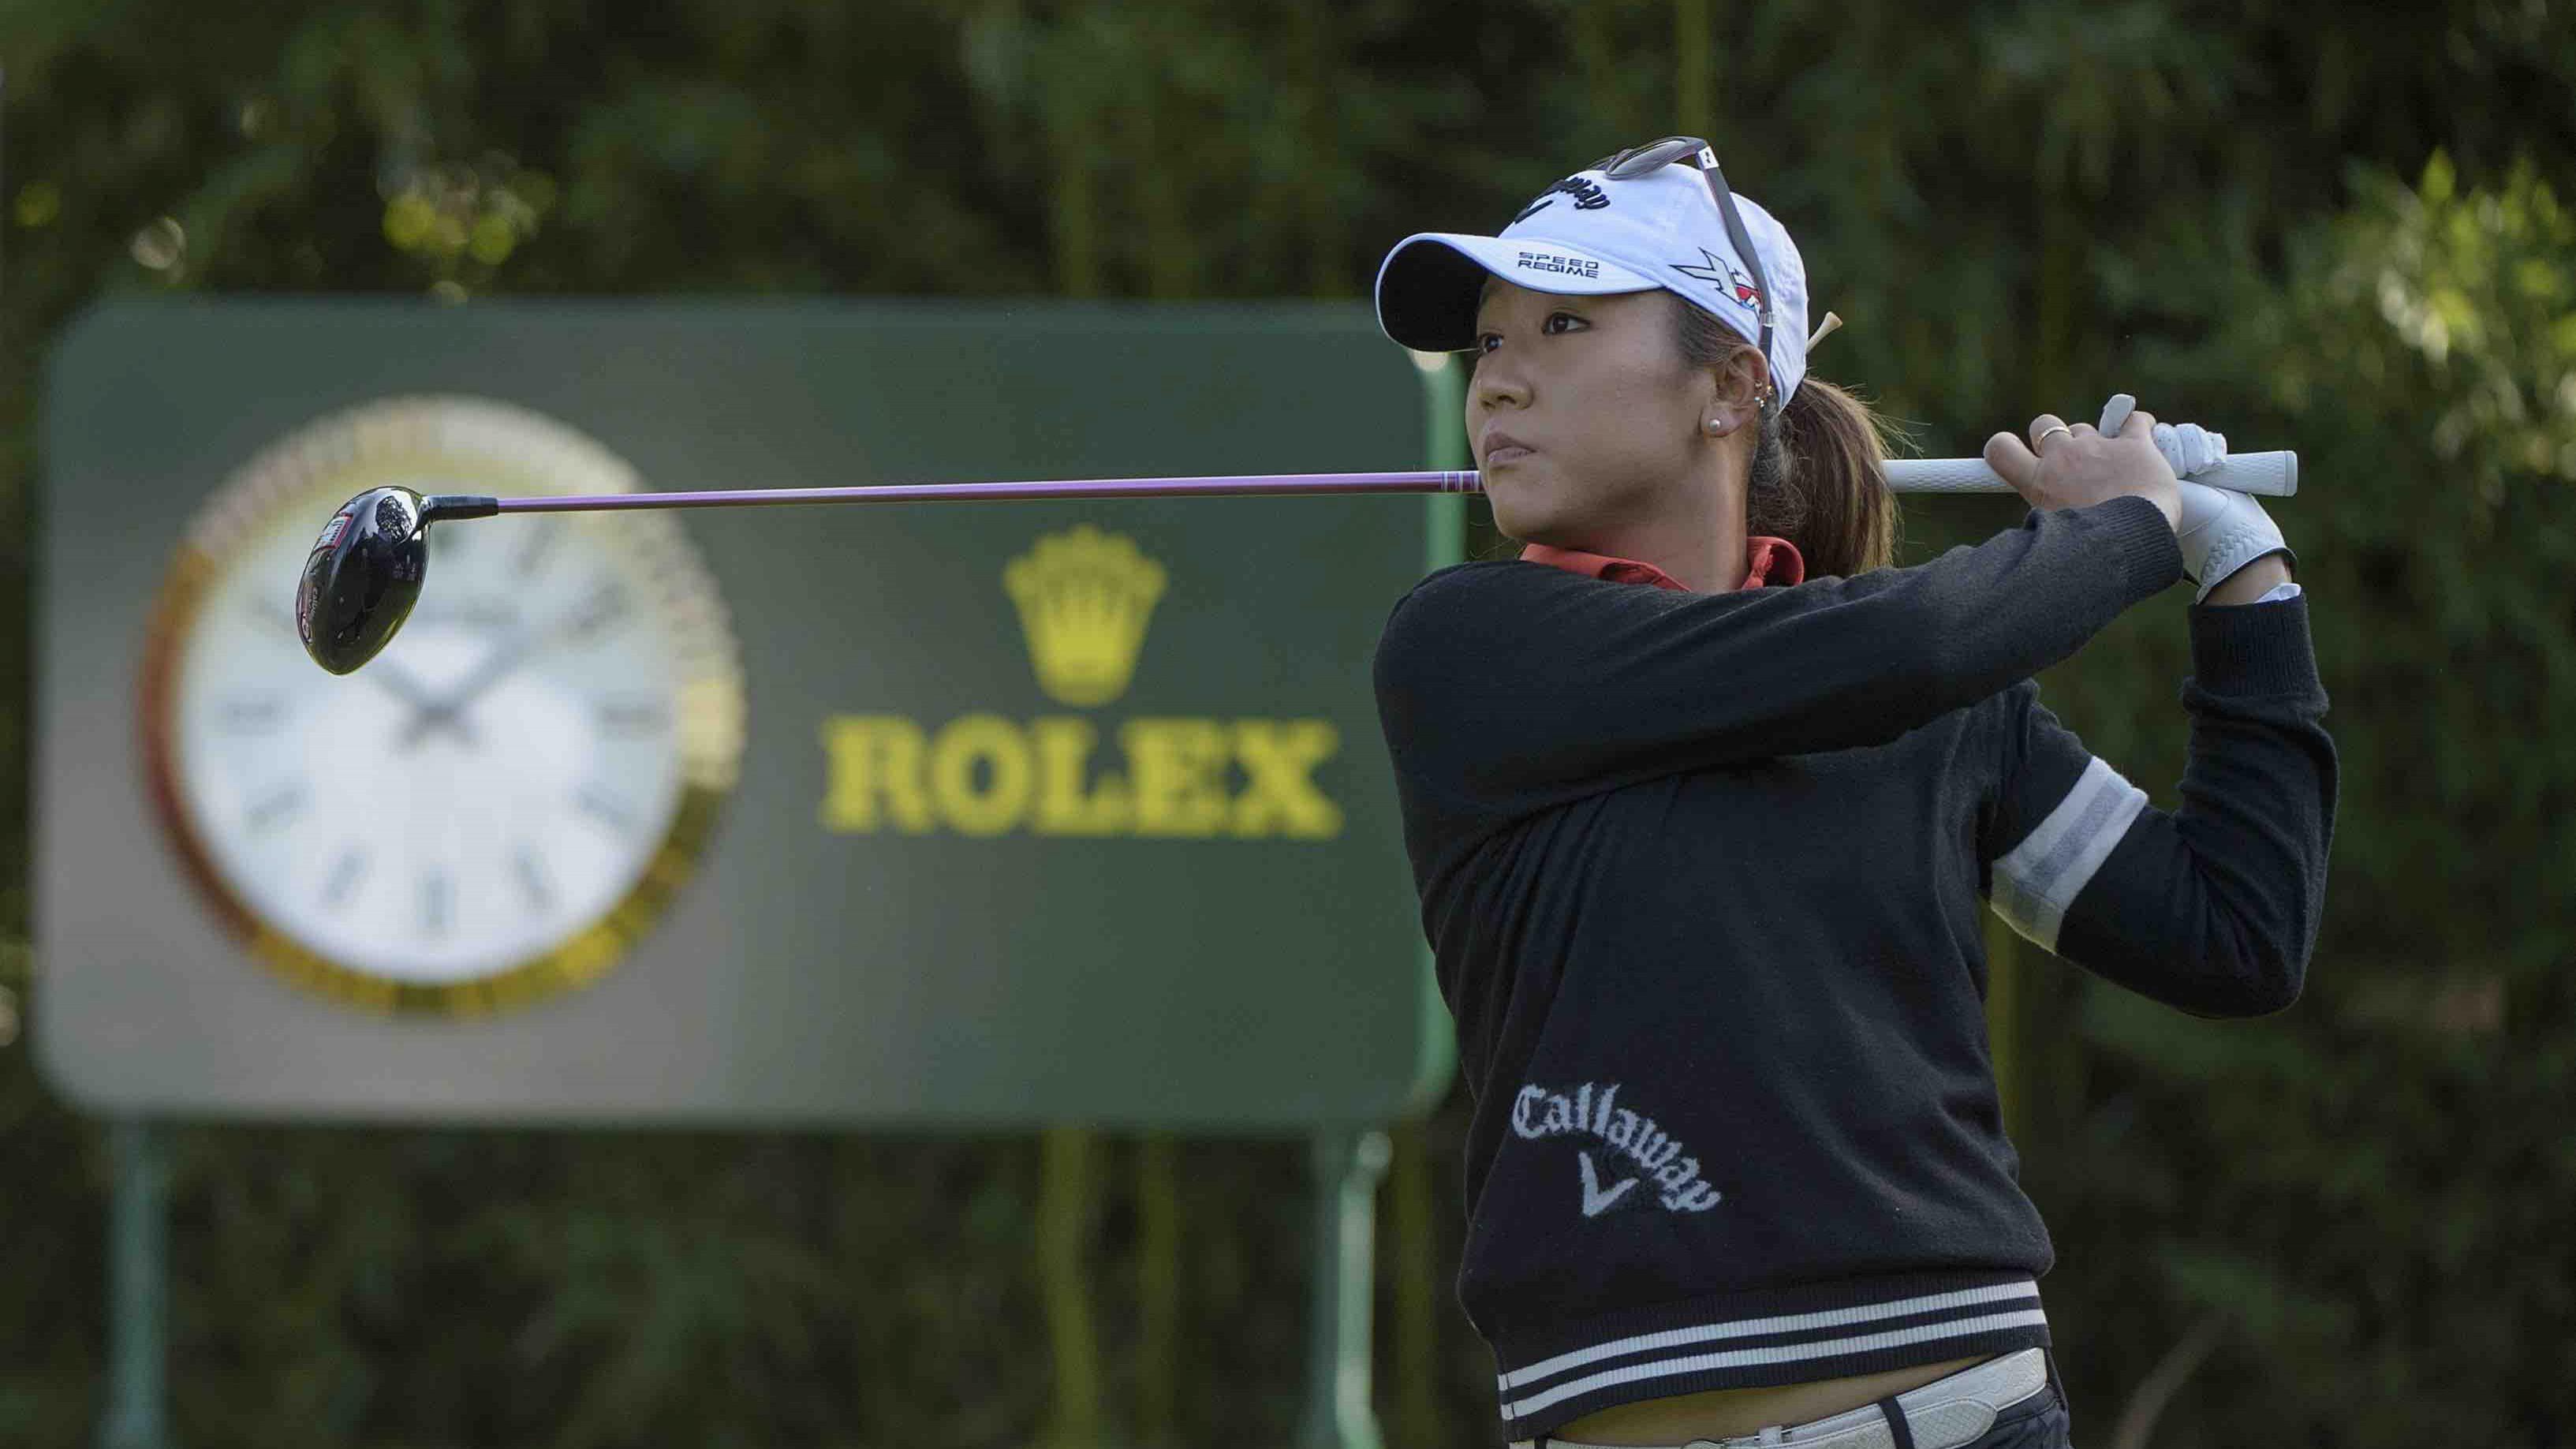 Rolex apoia o Portugal Masters